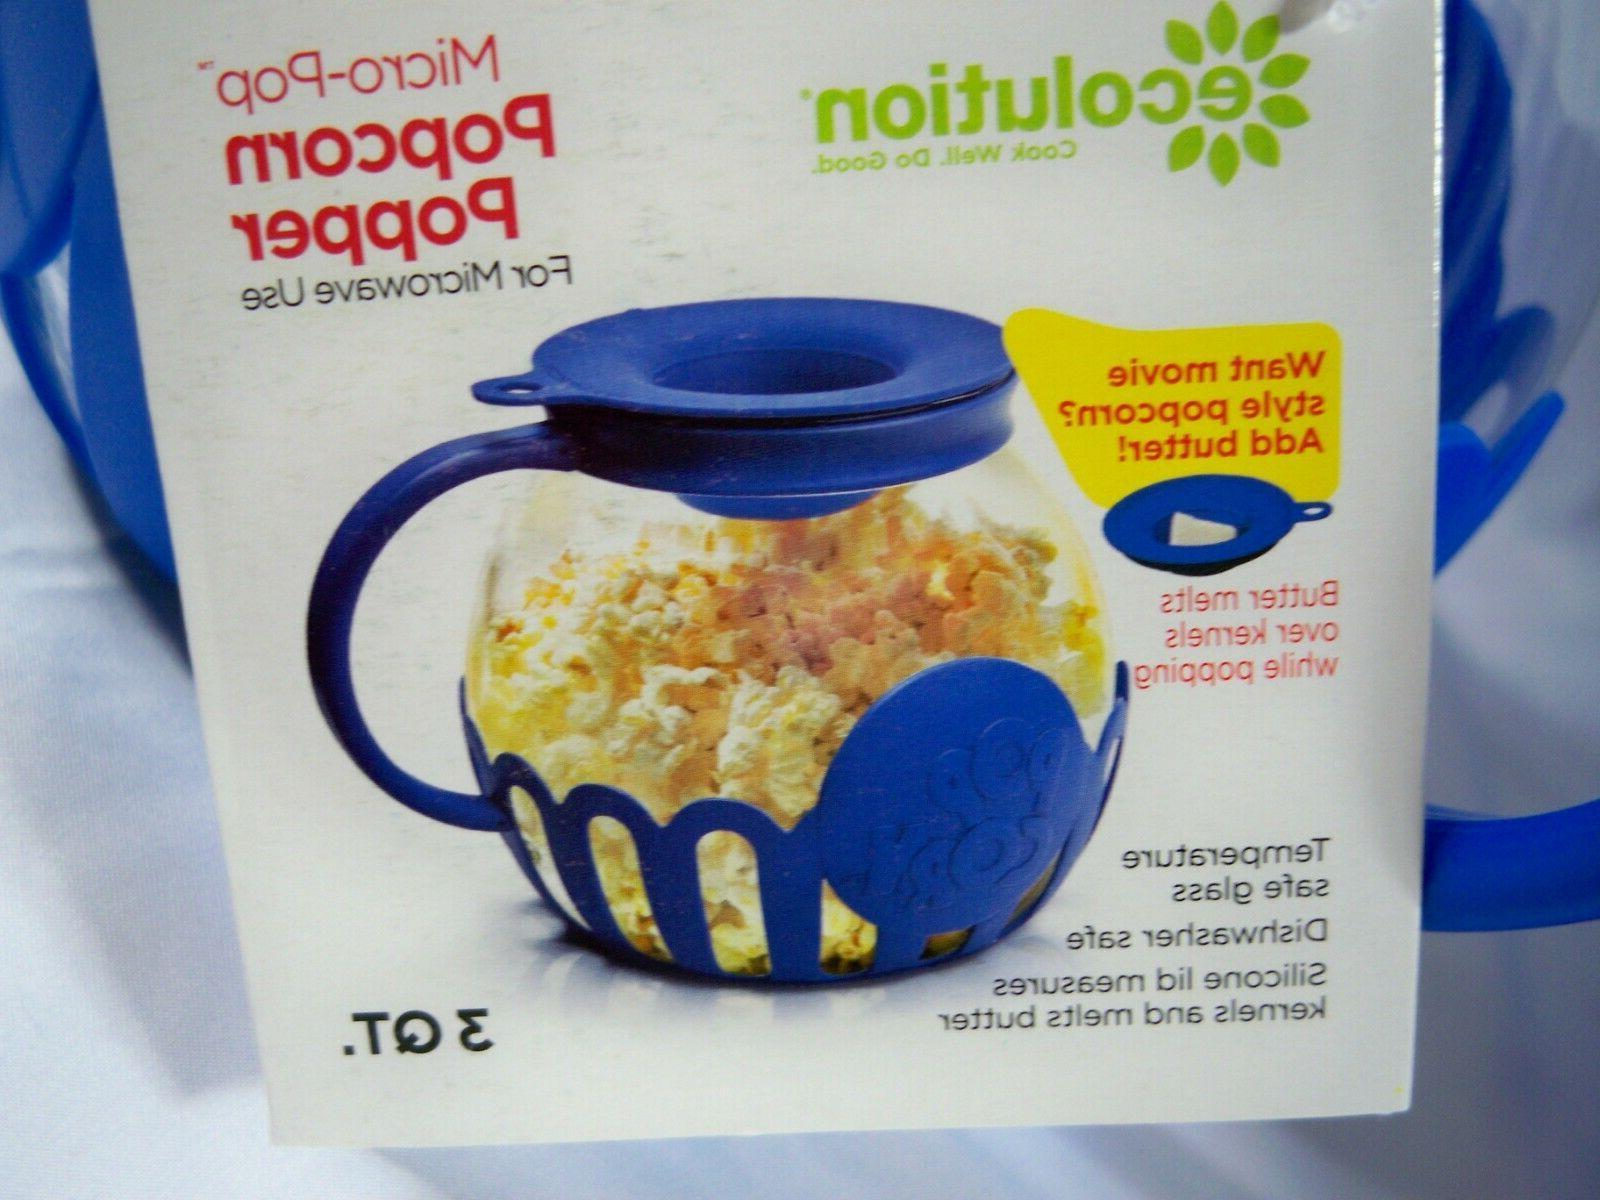 micro pop microwave 3 qt popcorn popper